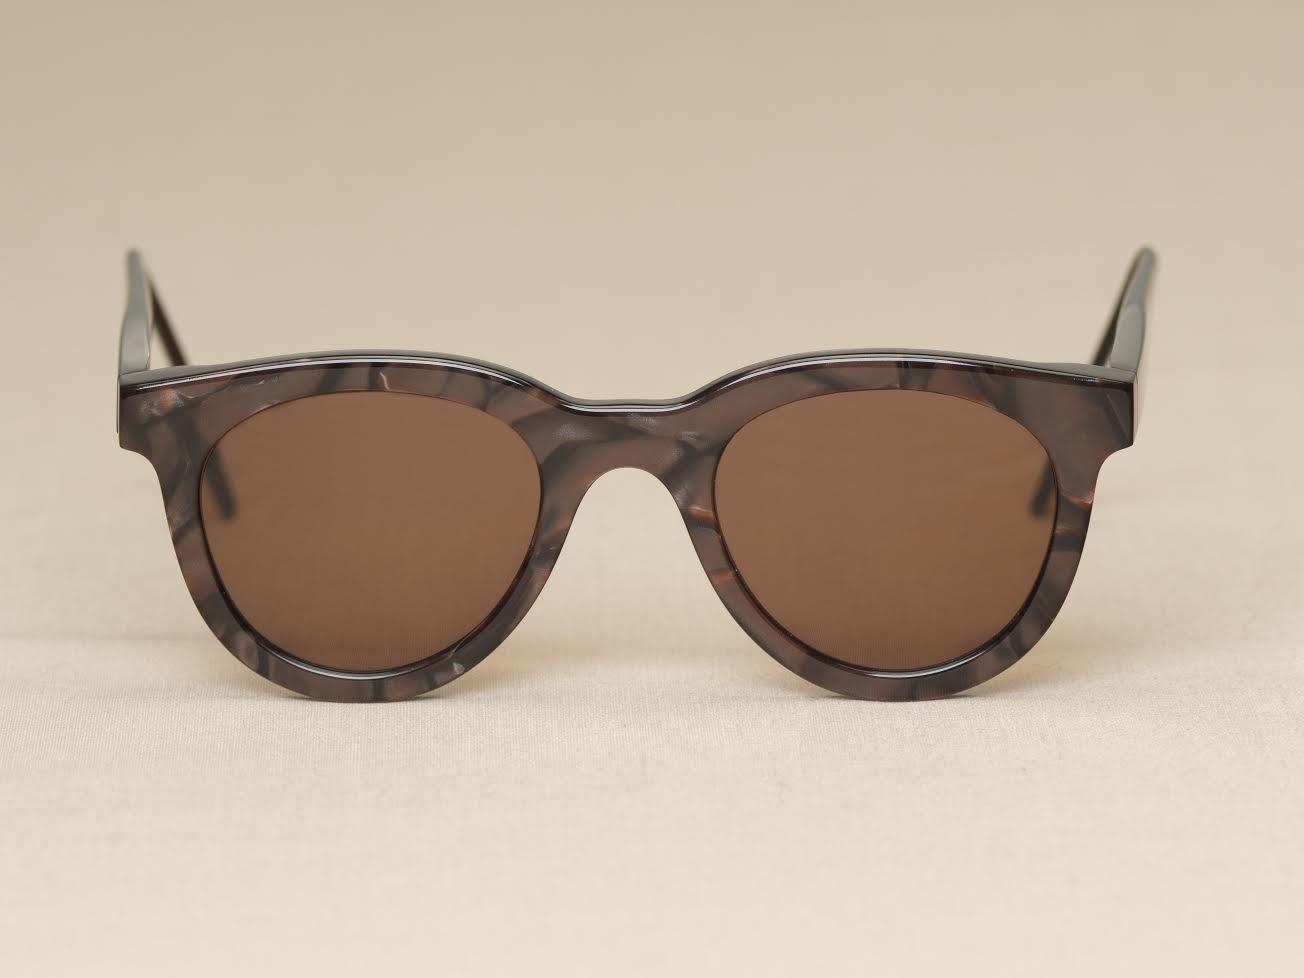 Indivijual-Custom-Sunglasses-2.jpg